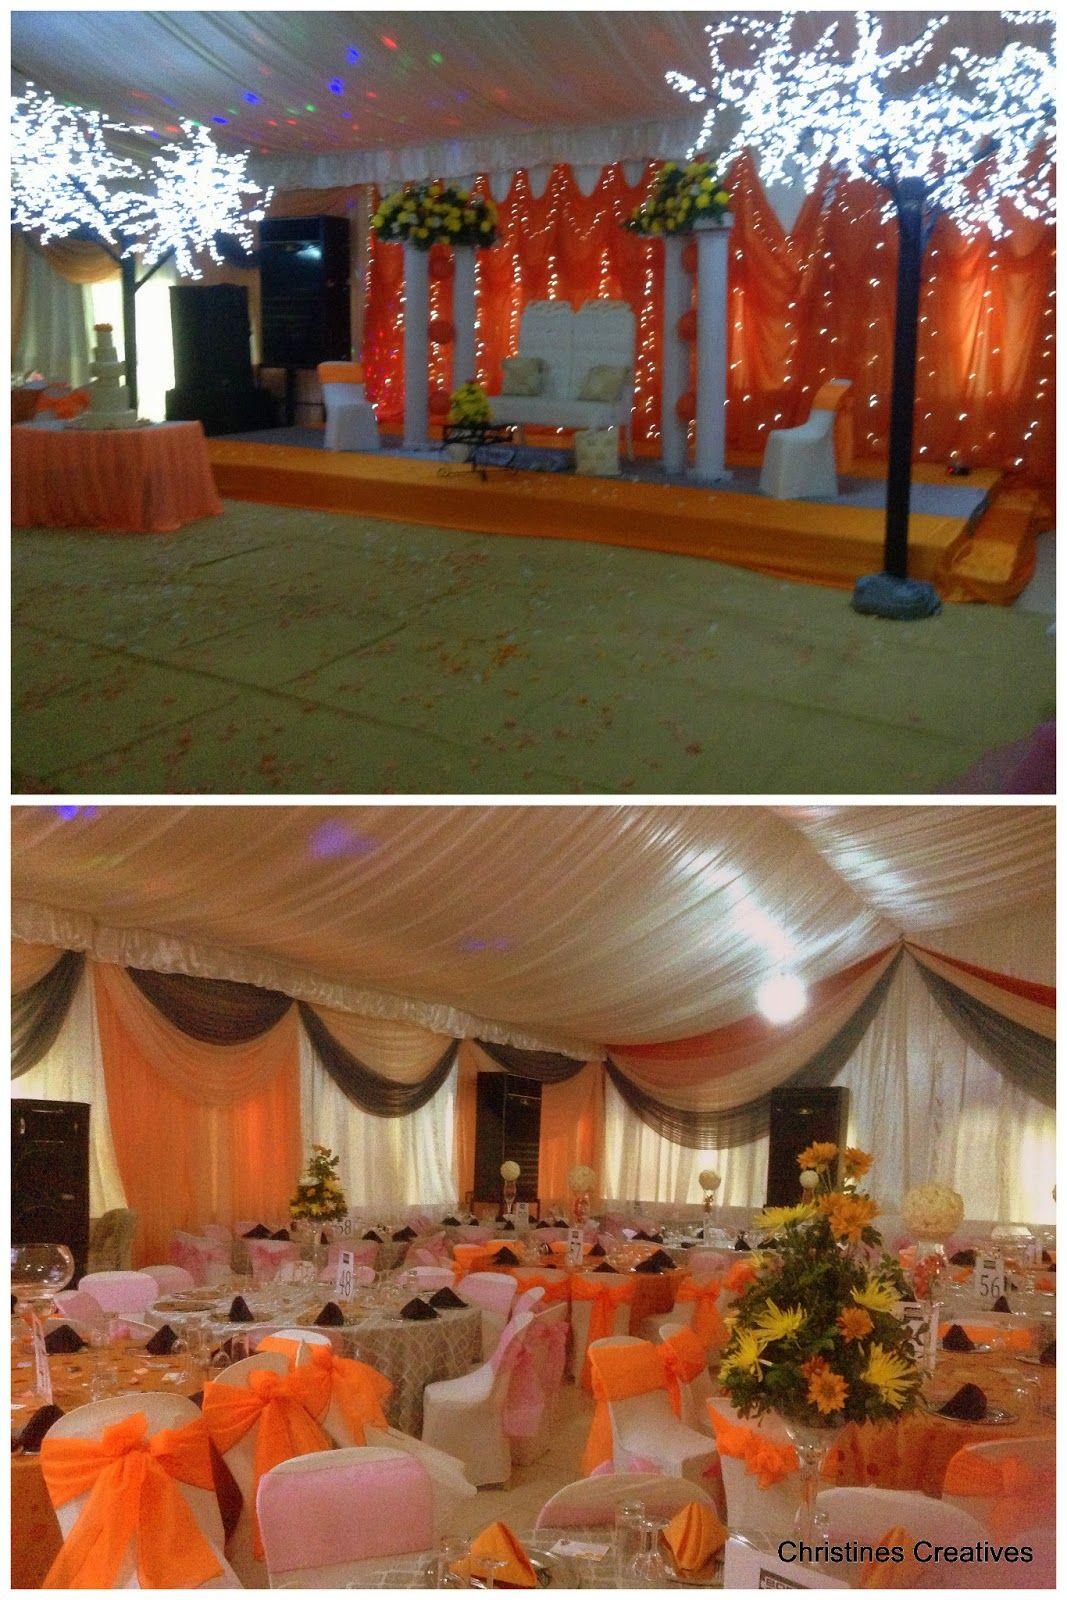 Nigerian Wedding Event Decor By Christines Creatives Nigeria Limited